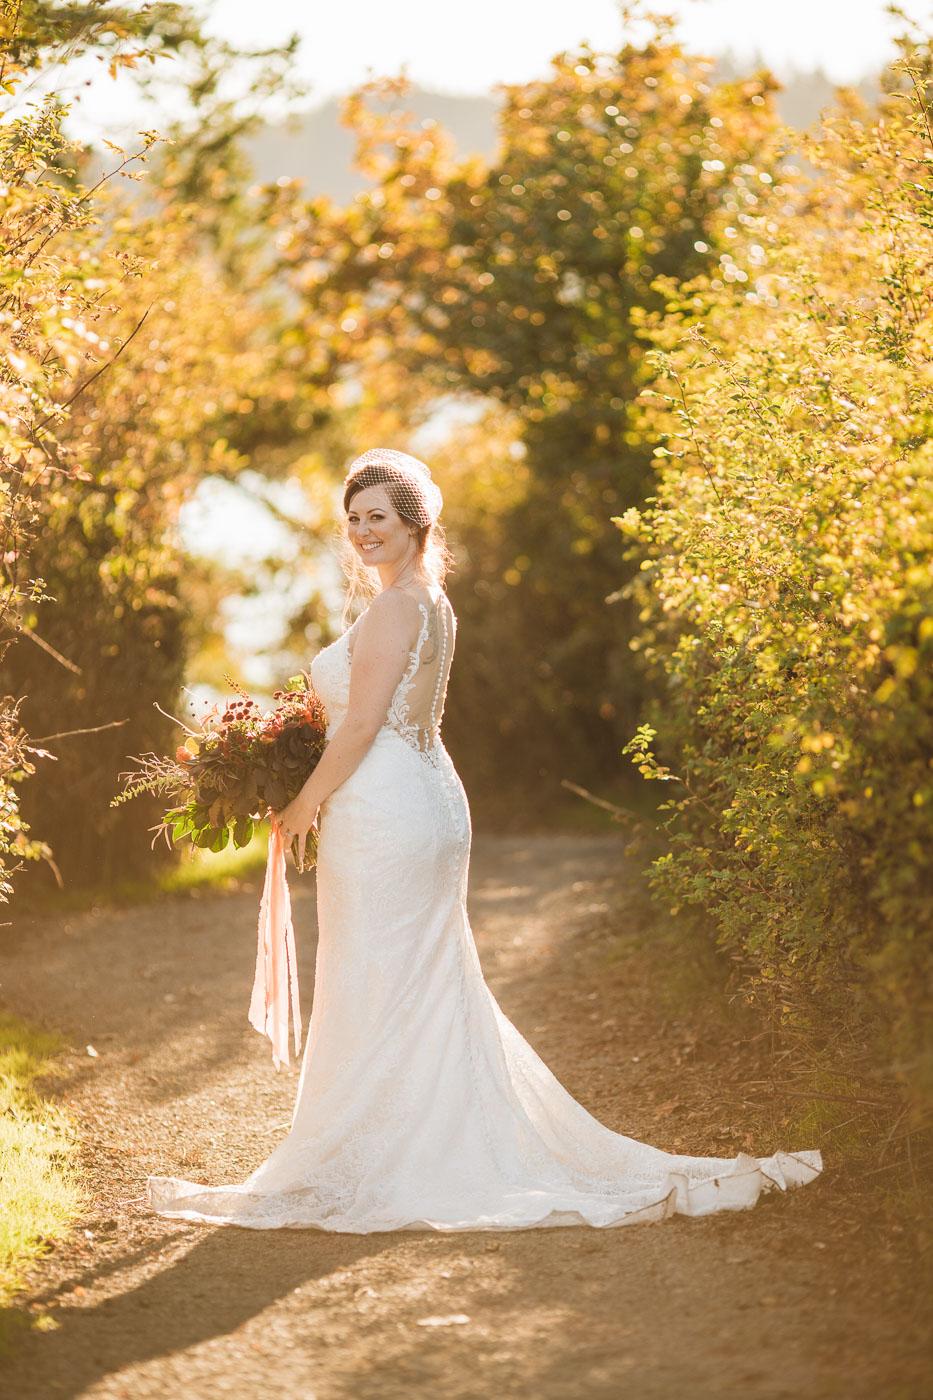 Jon-Mark Photography Victoria BC Wedding Photography - Hatley Castle Wedding Photography - Bear Mountain Wedding Photography bride